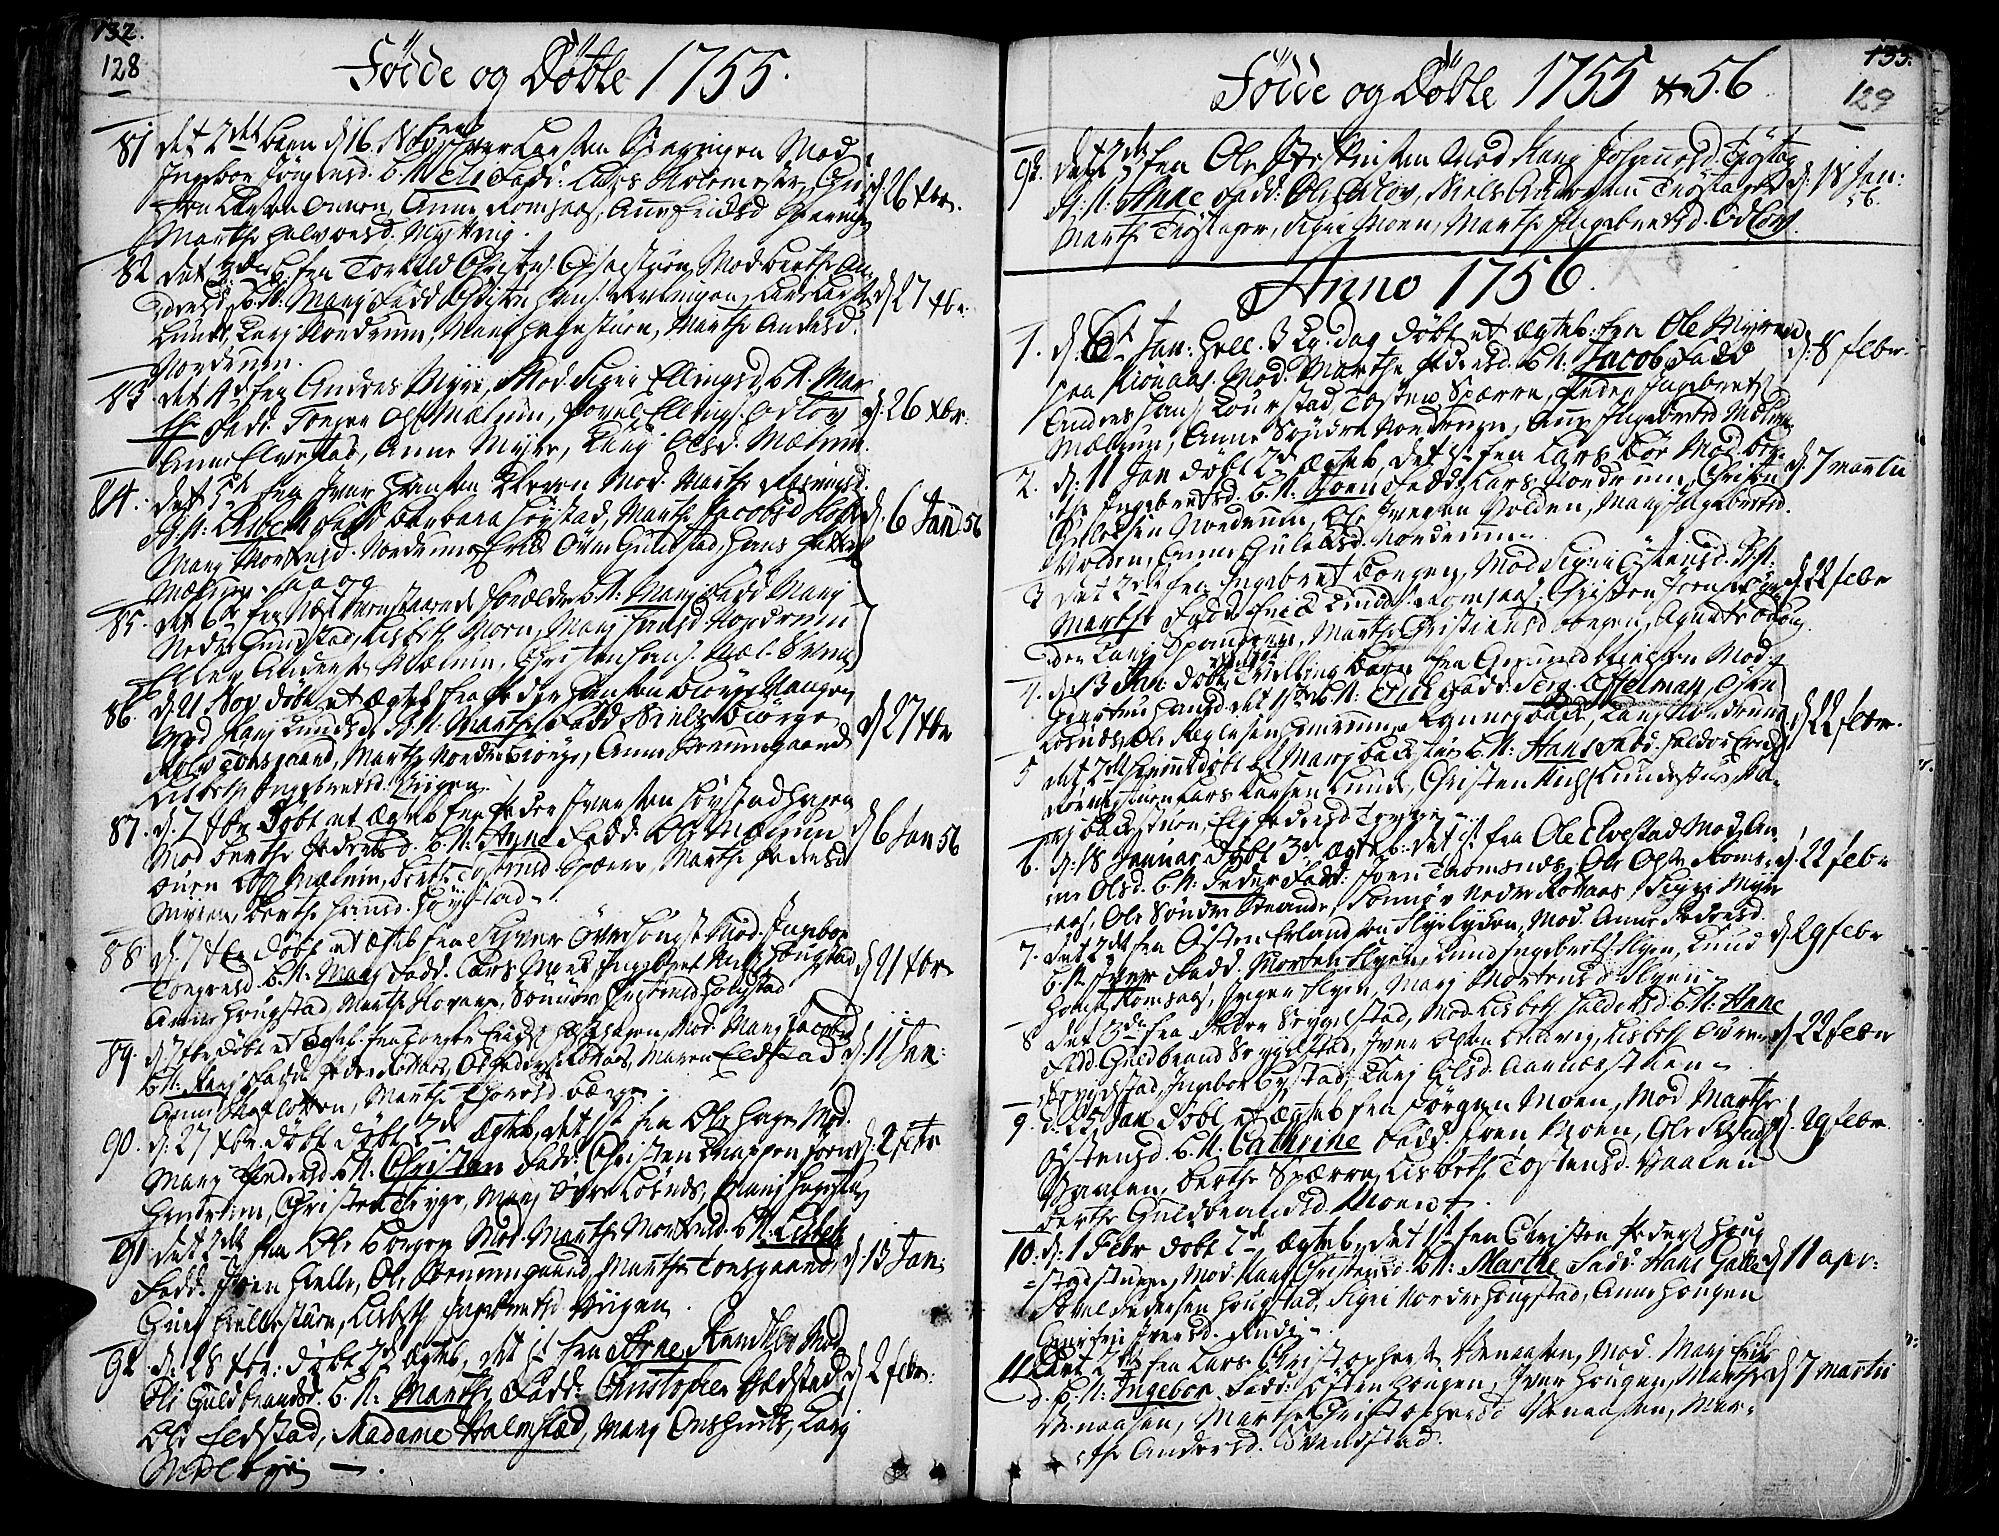 SAH, Ringebu prestekontor, Ministerialbok nr. 2, 1734-1780, s. 128-129